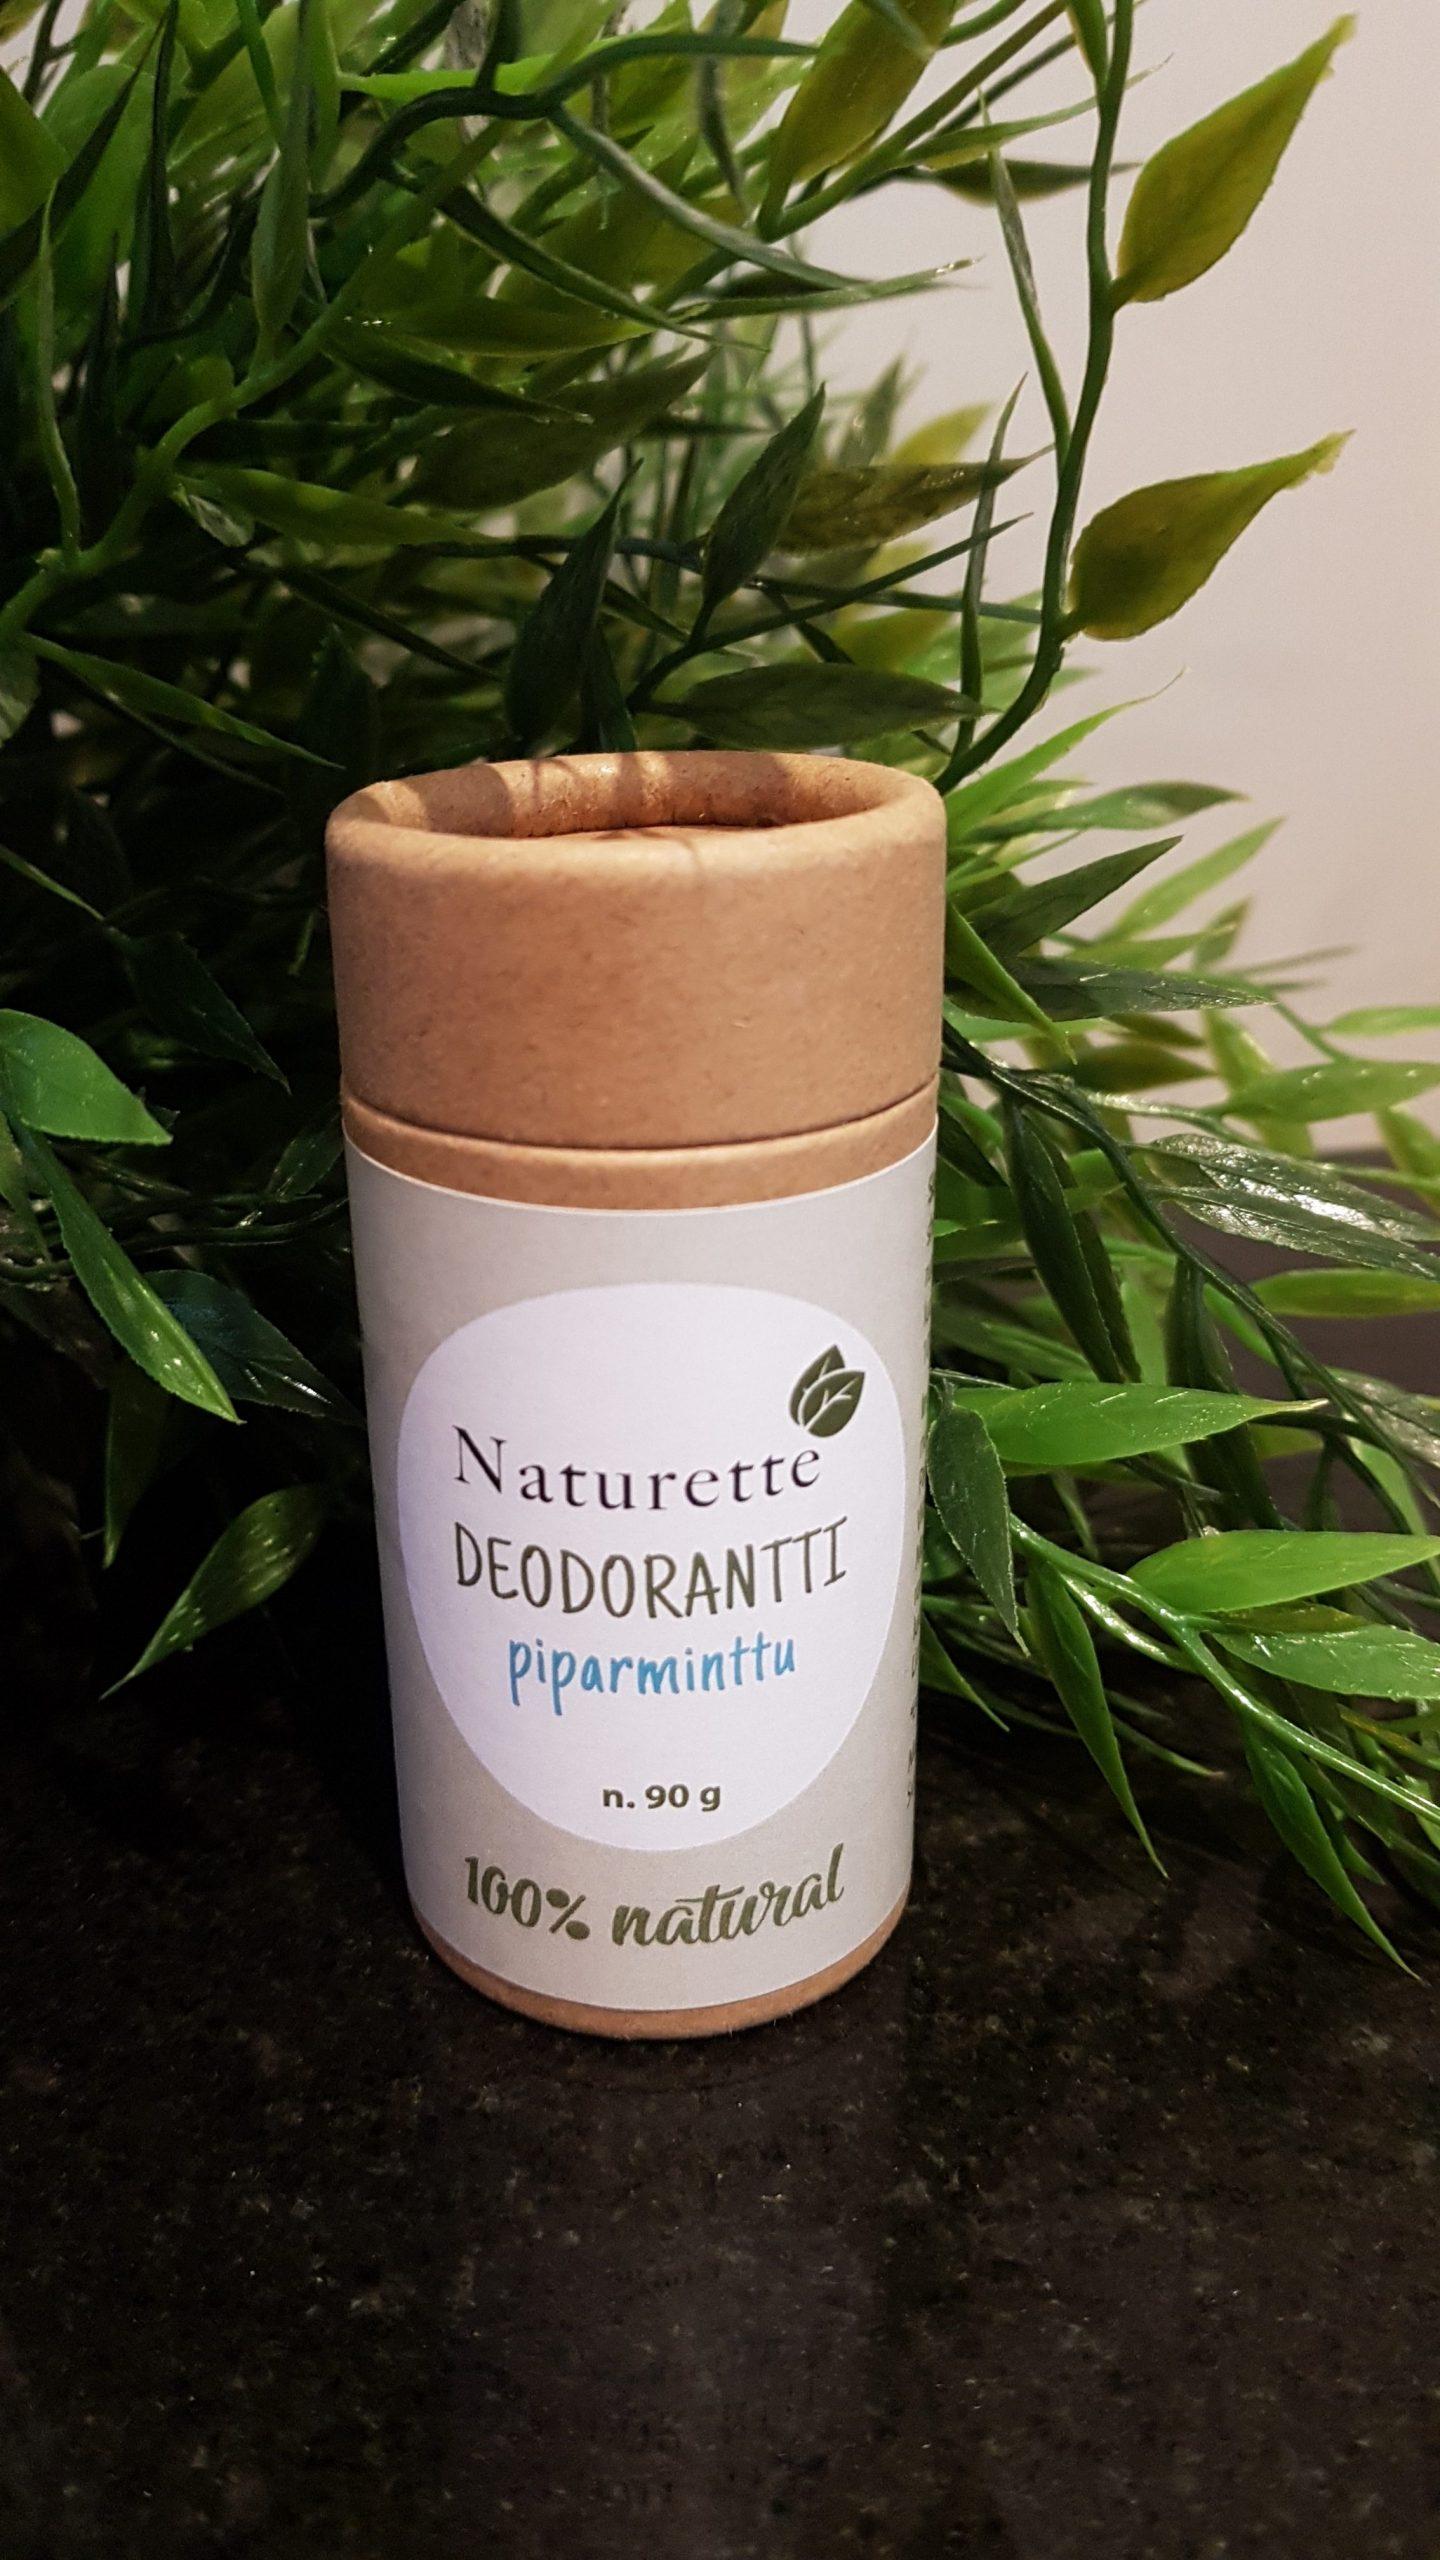 Naturette deodorantti-stick, Piparminttu, ekologinen, luomu, kotimainen, 90g